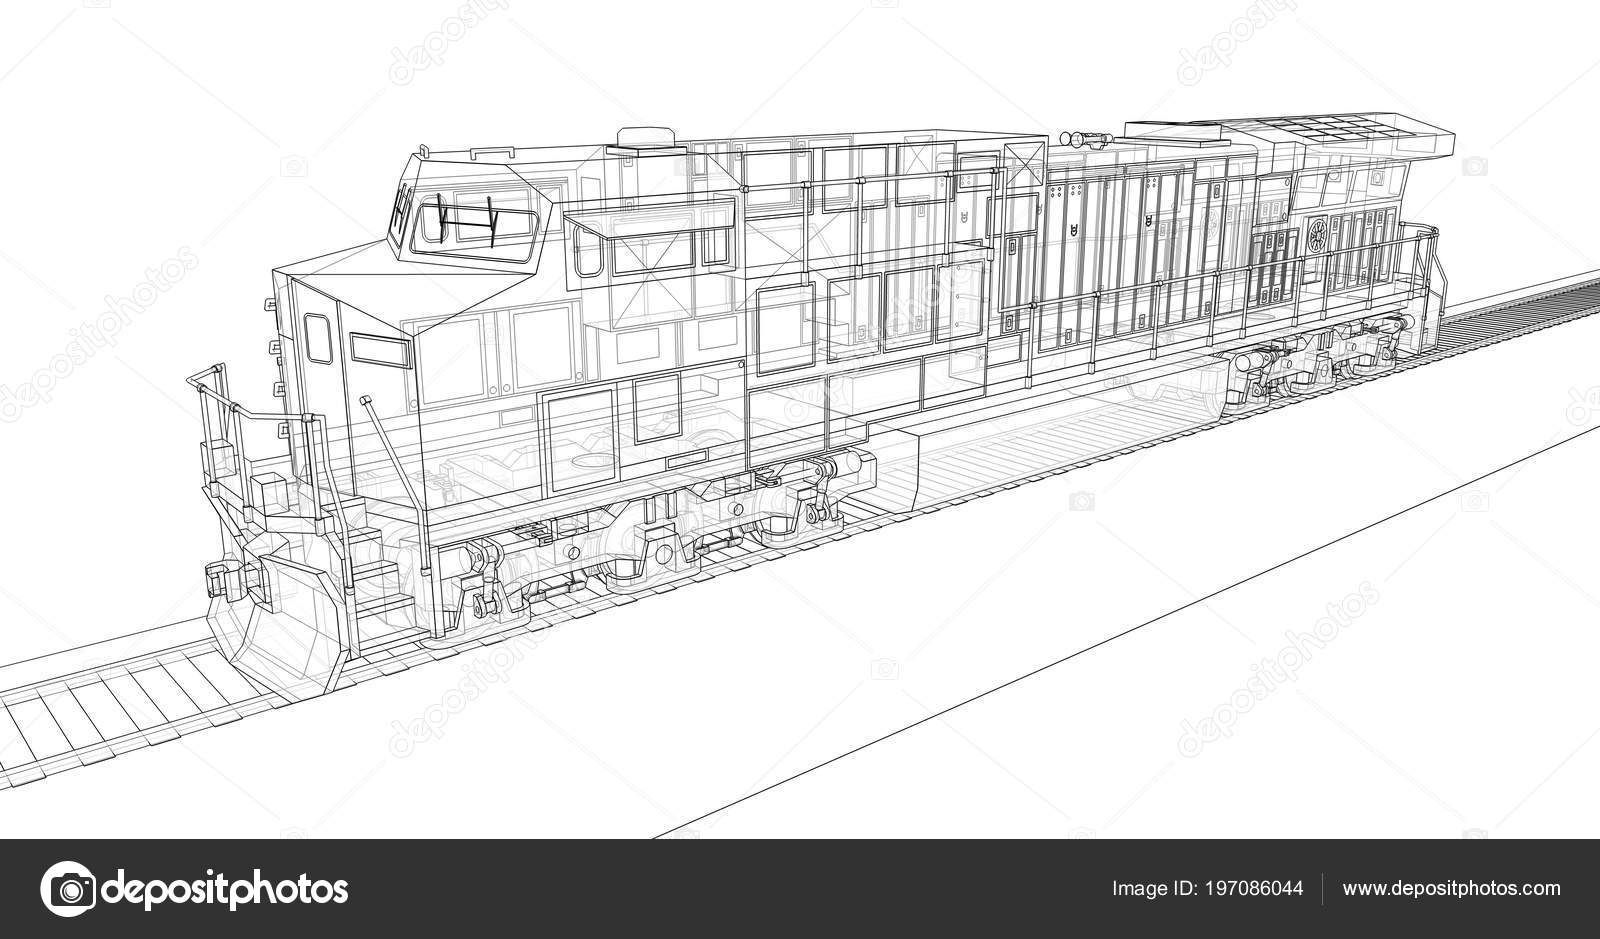 Modern Diesel Railway Locomotive Great Power Strength Moving